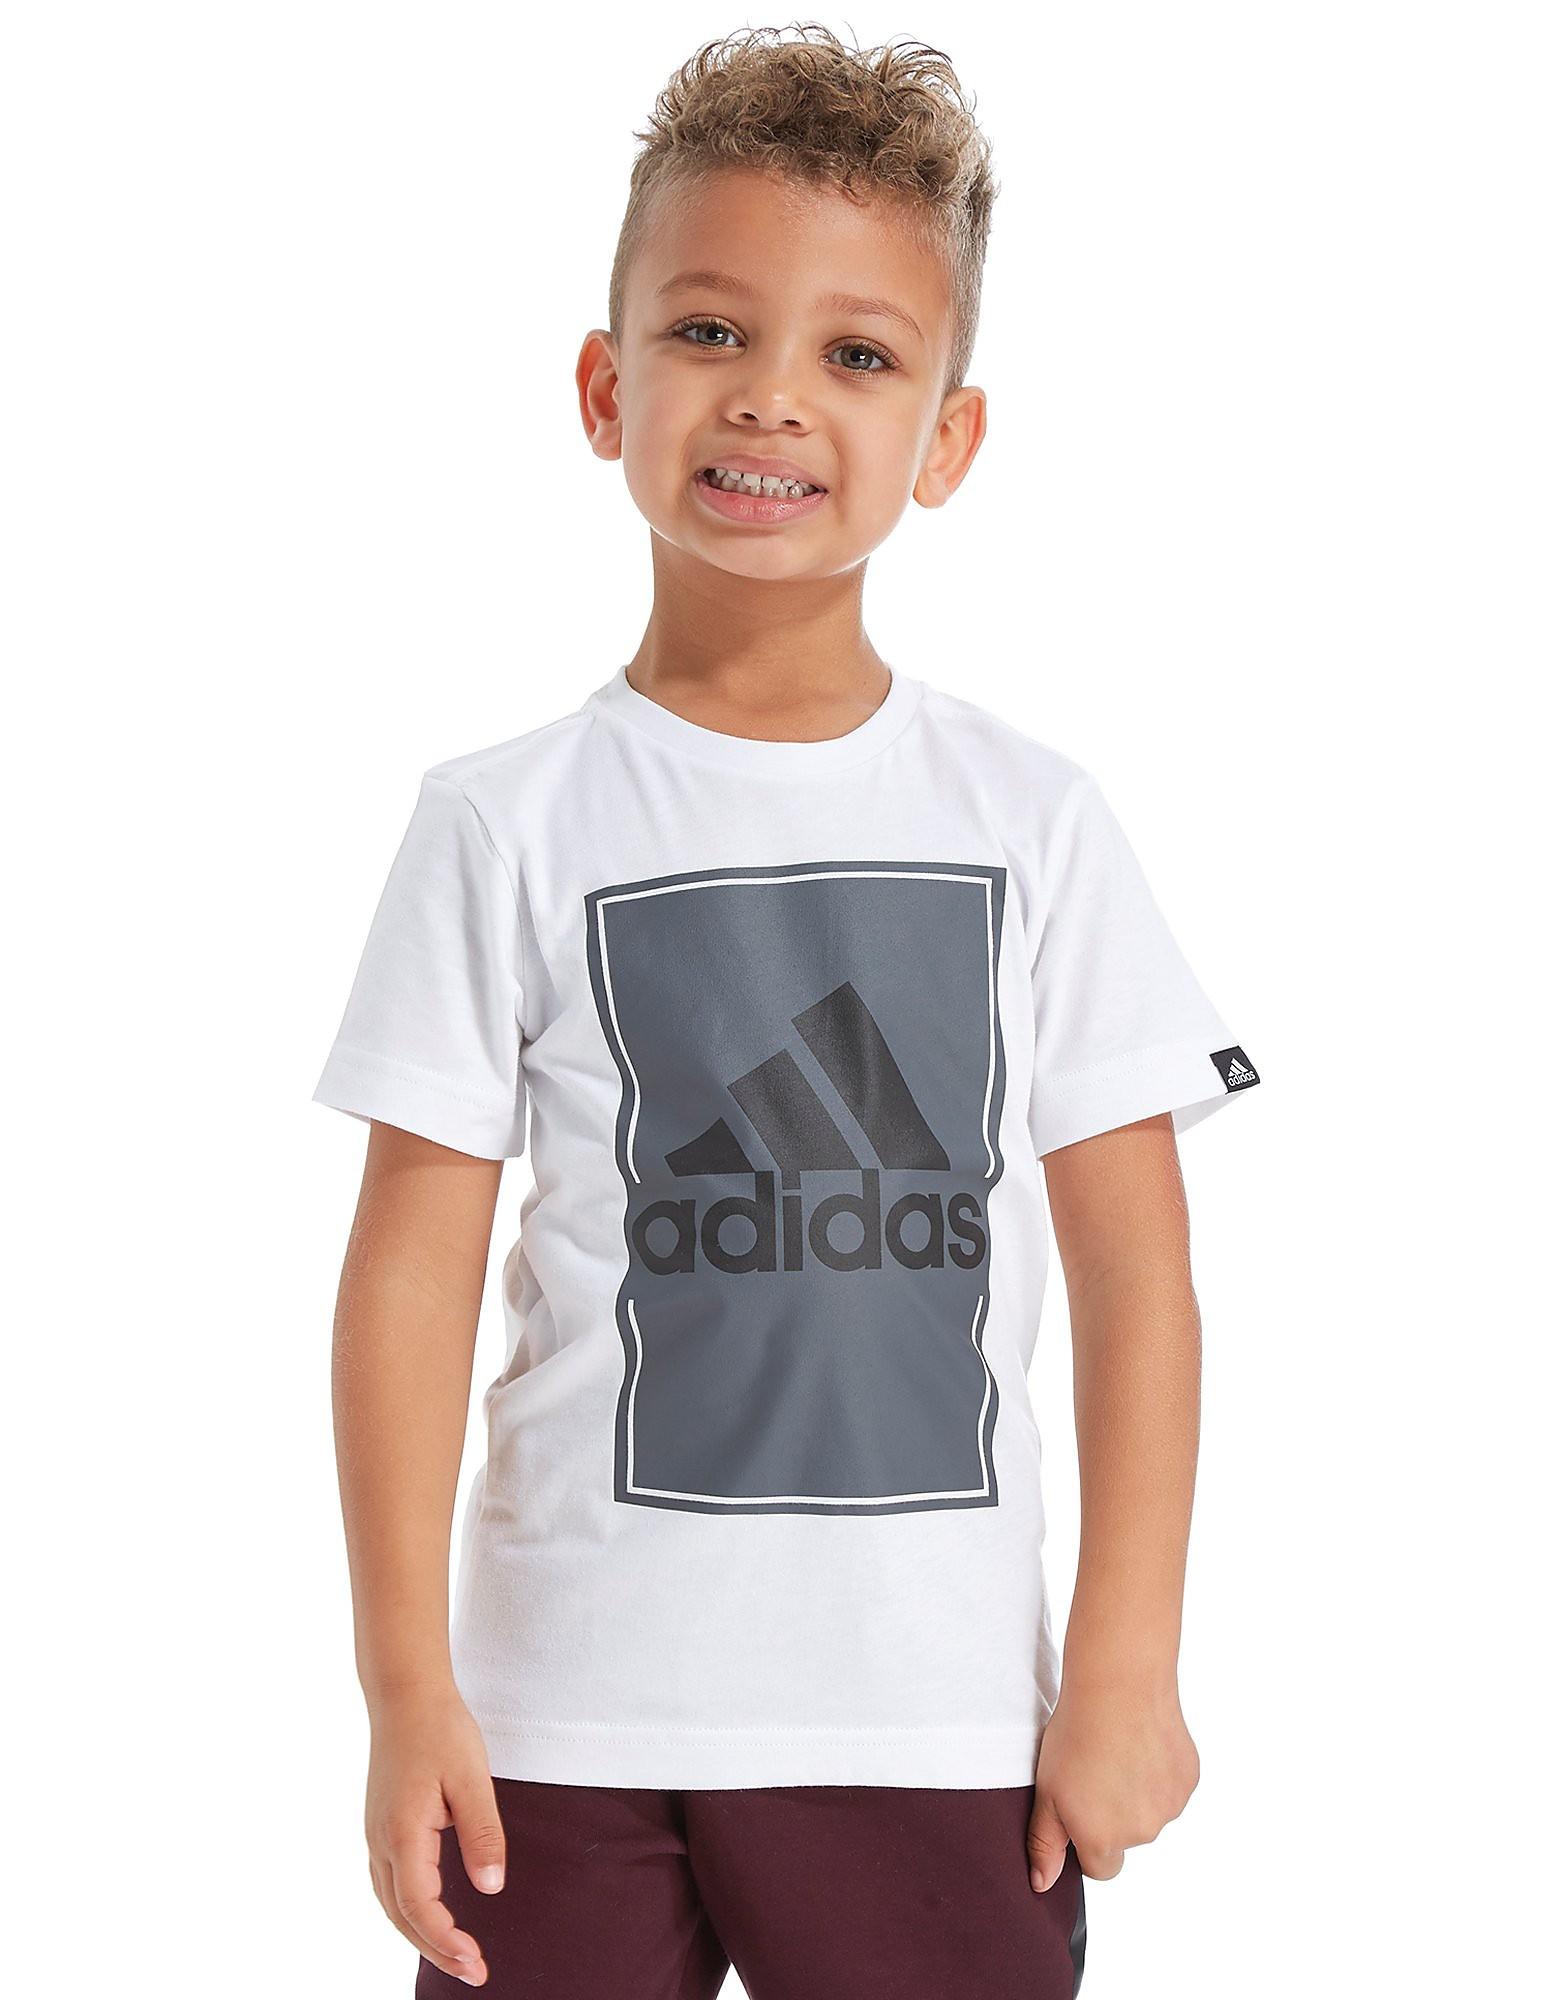 adidas Box T-Shirt Children